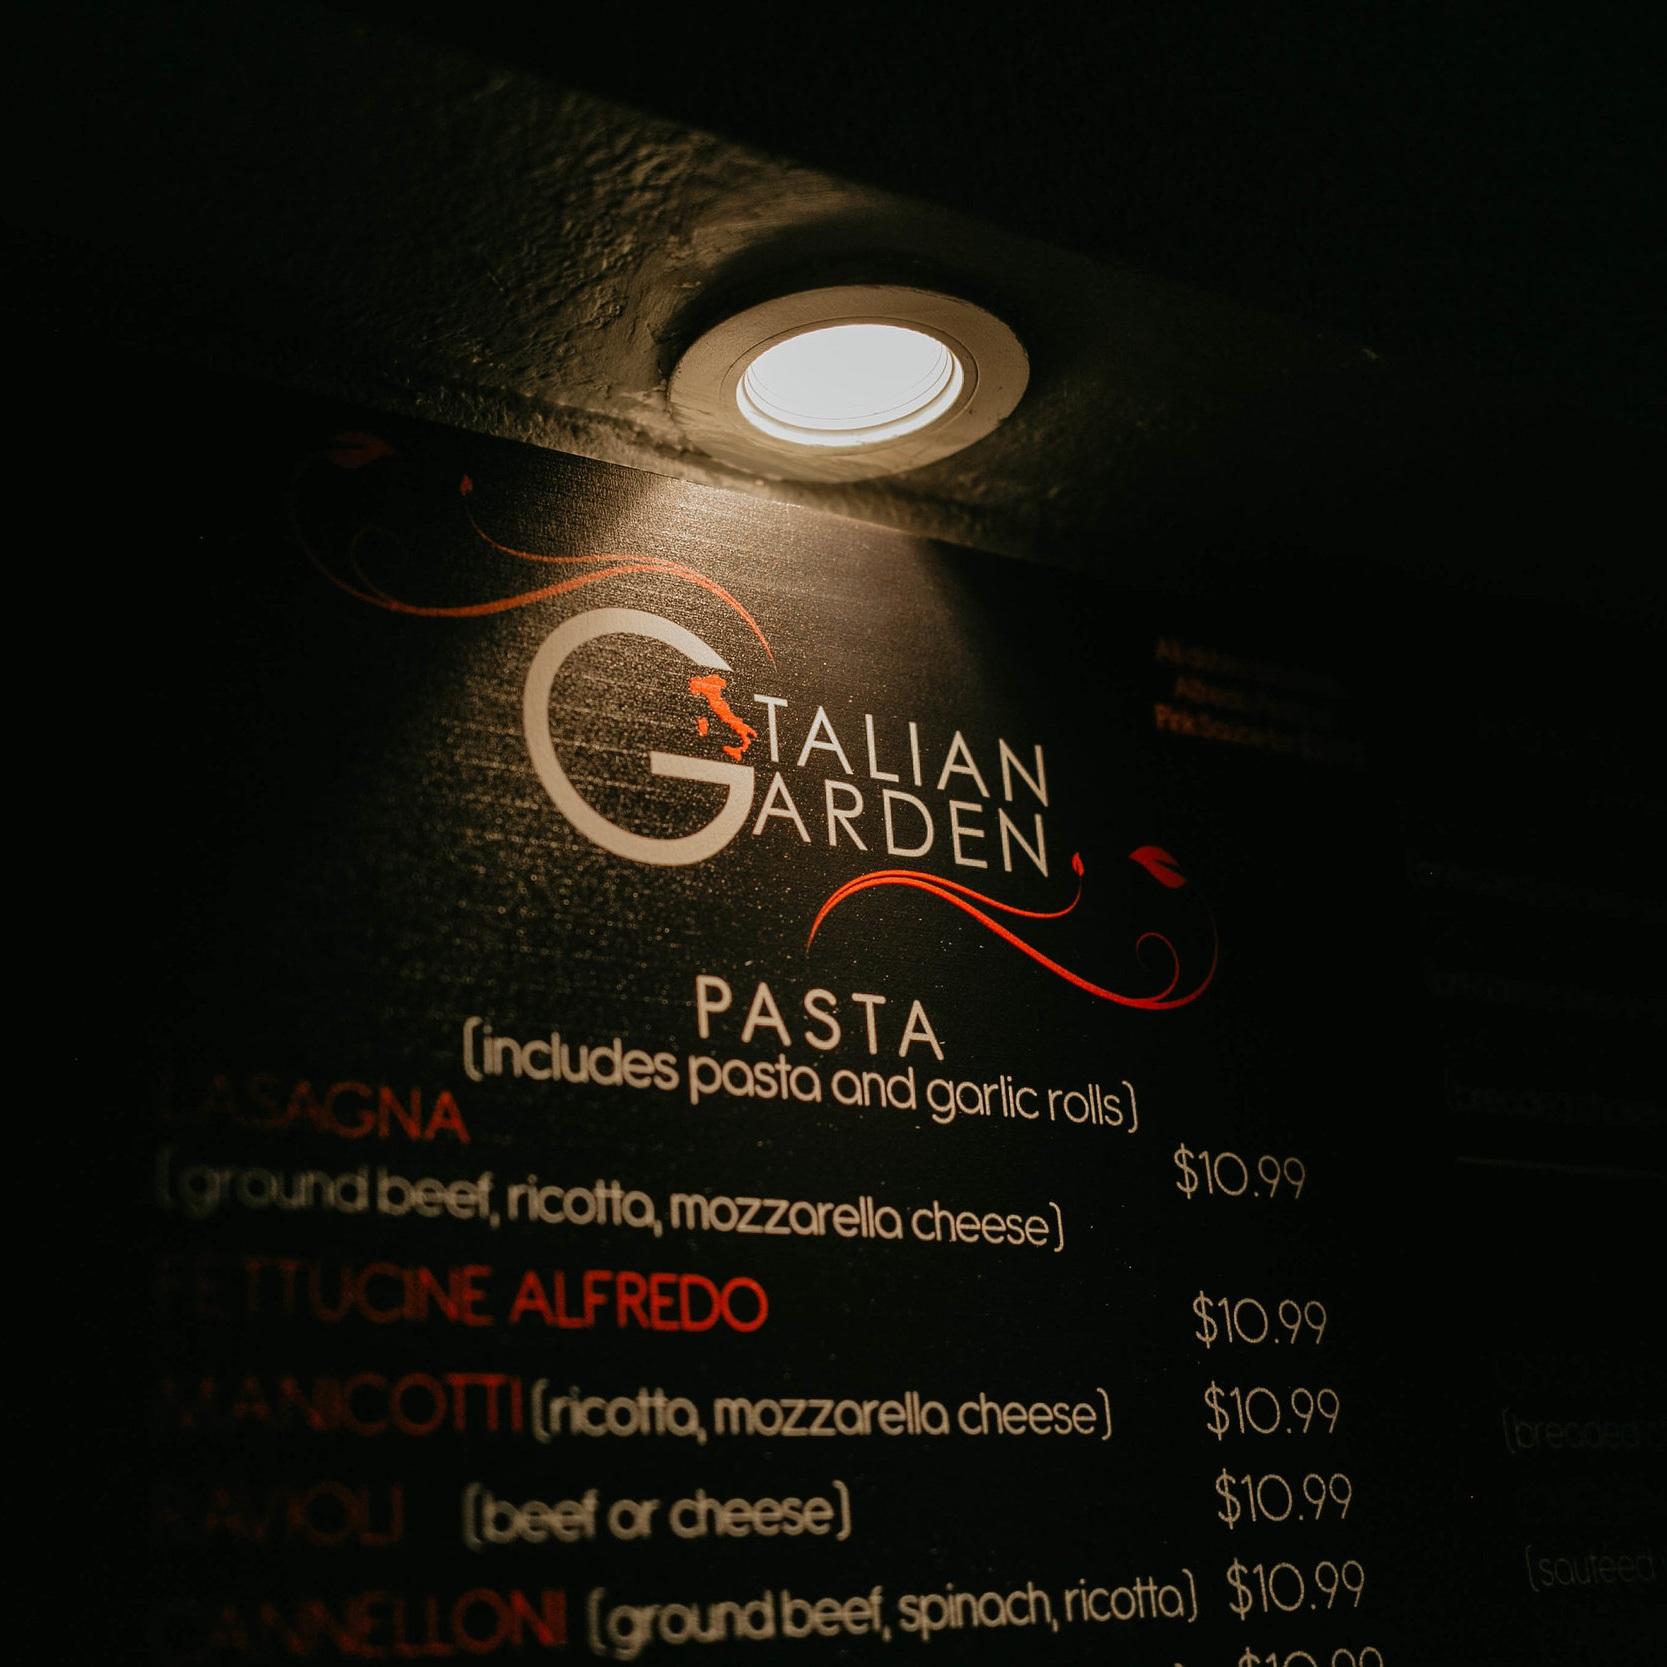 Italian Garden - 10% Off Your Meal